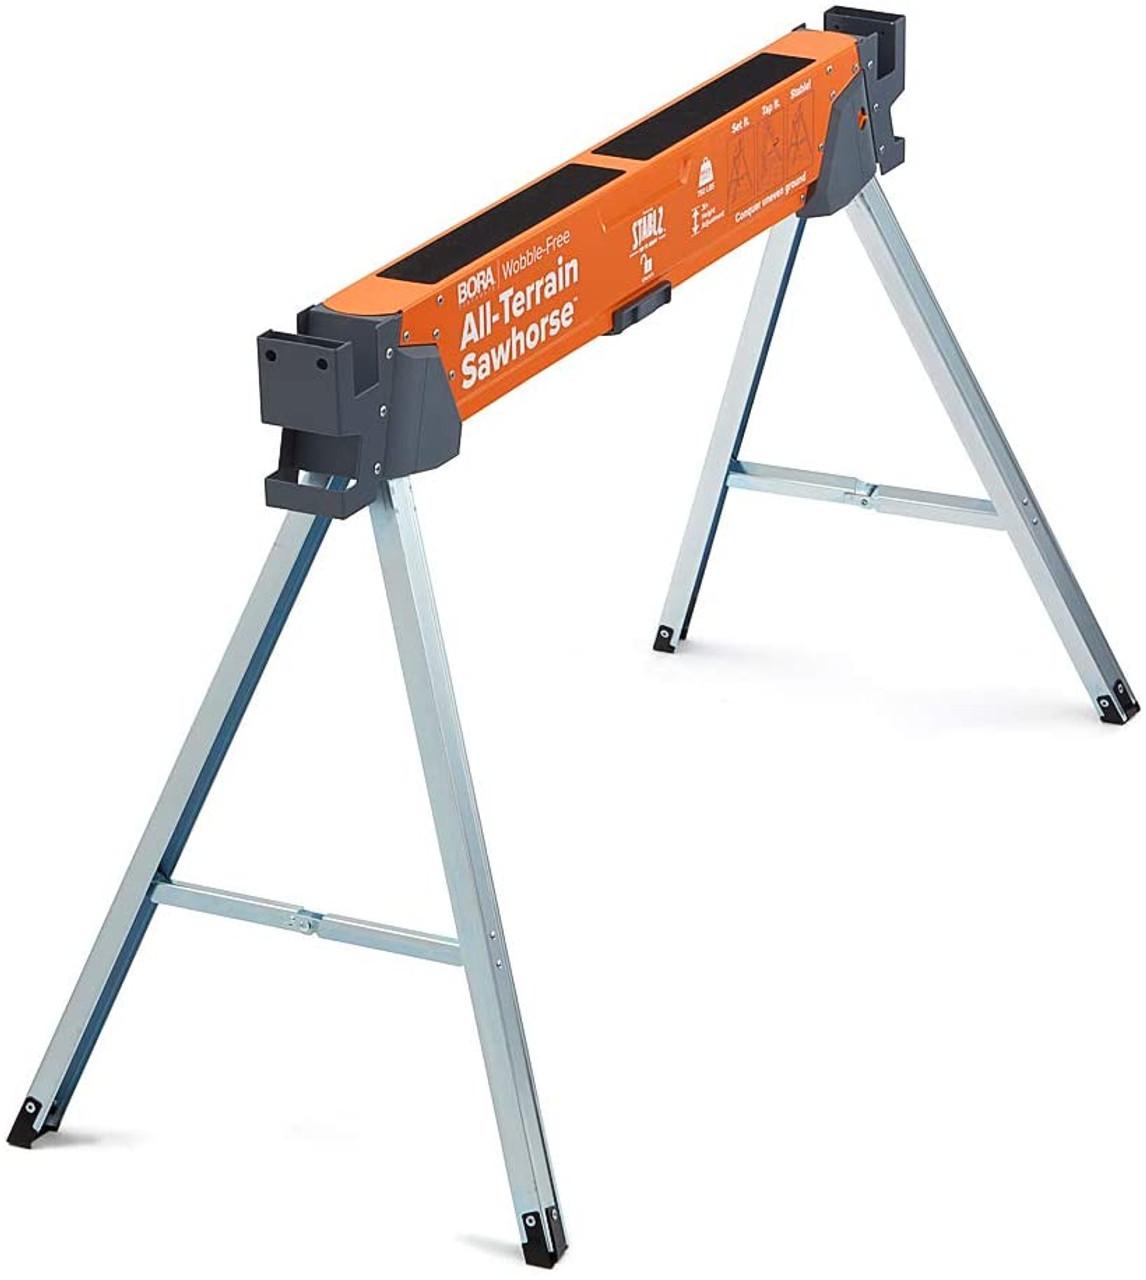 Bora Portamate All-Terrain Sawhorse Table Woodworking Carpenters PM-4520T